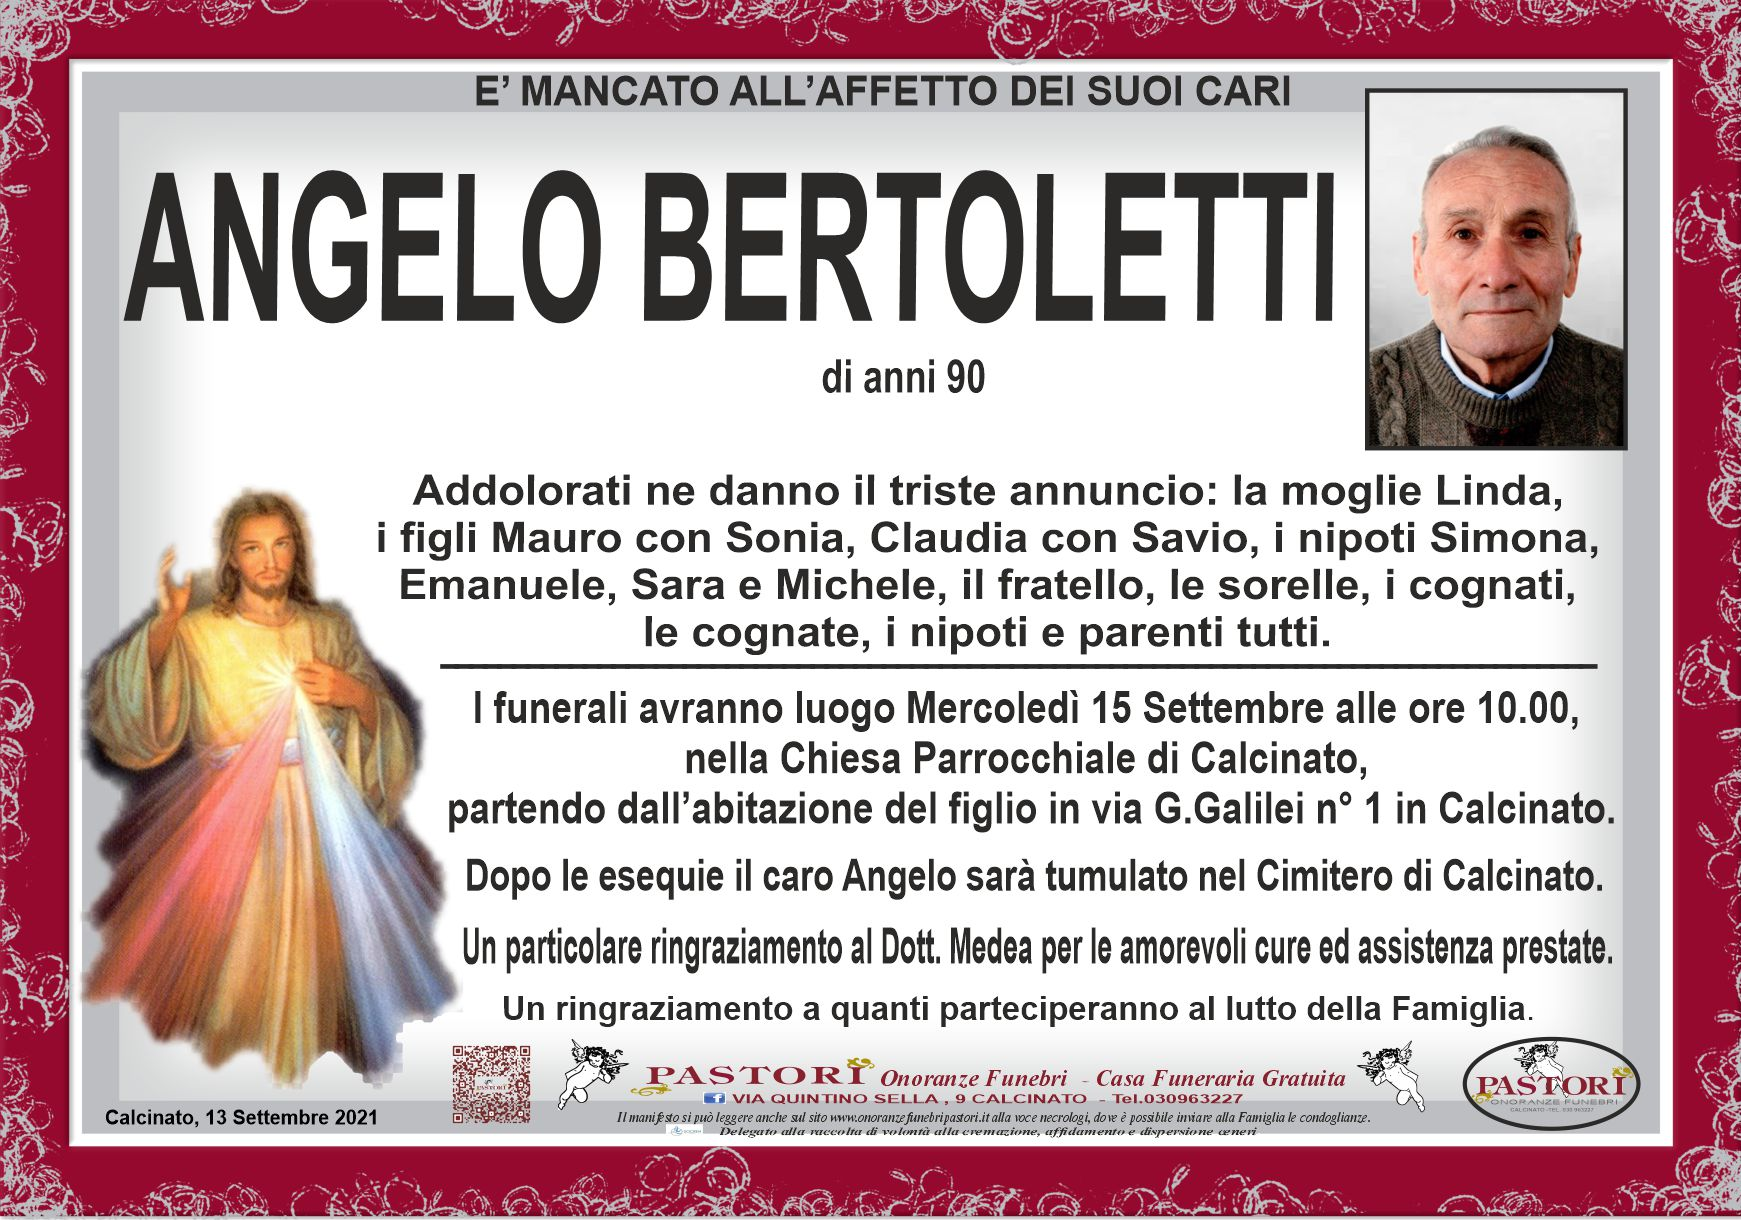 Angelo Bertoletti